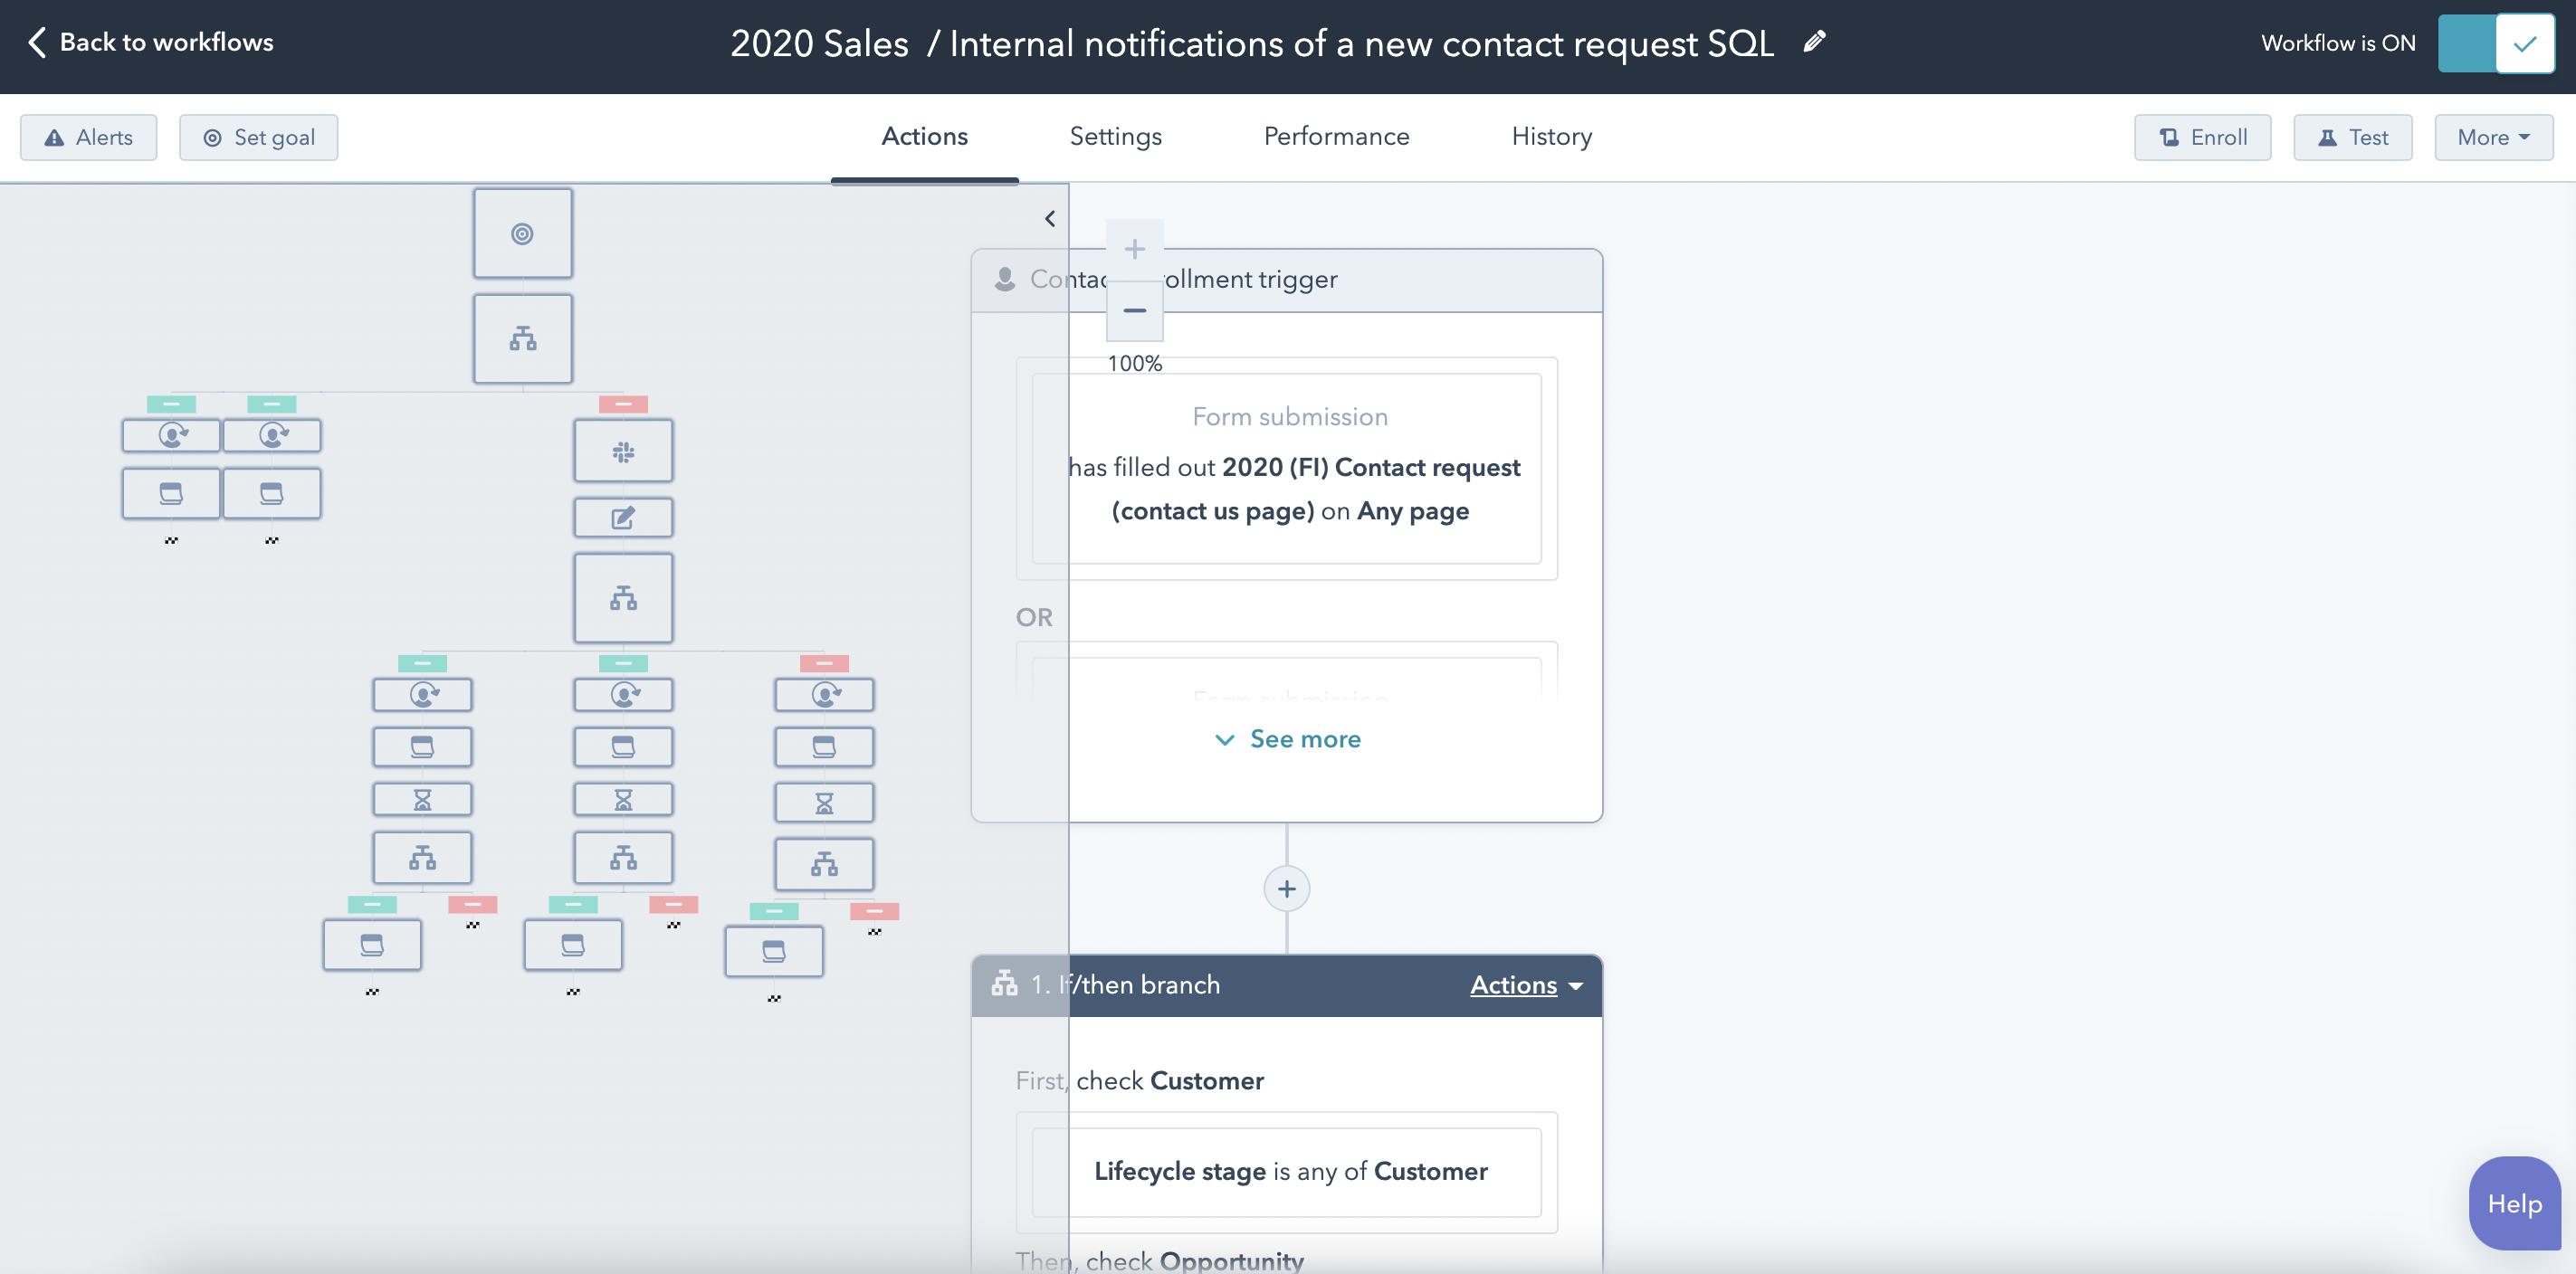 Workflow minimap